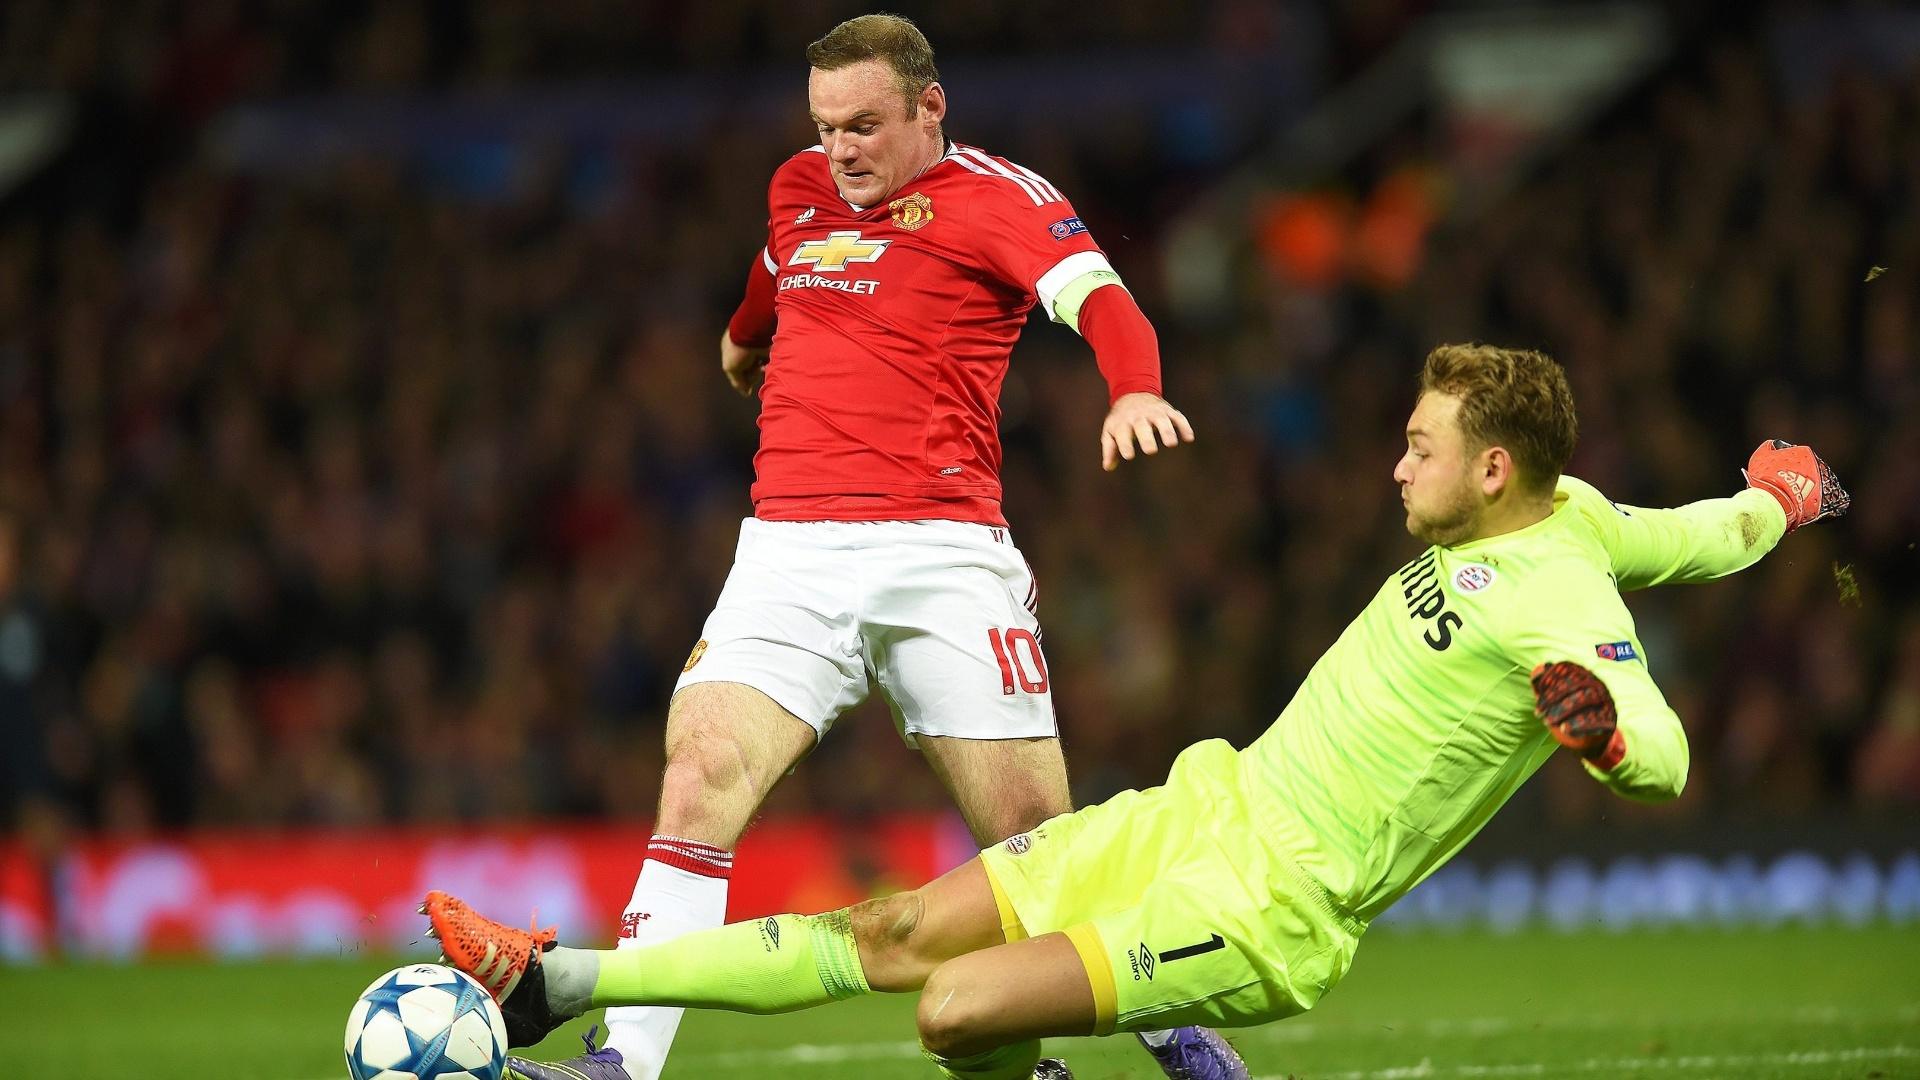 Atacante do Manchester United, Rooney tenta driblar o goleiro do PSV, Jeroen Zoet, em duelo na Inglaterra